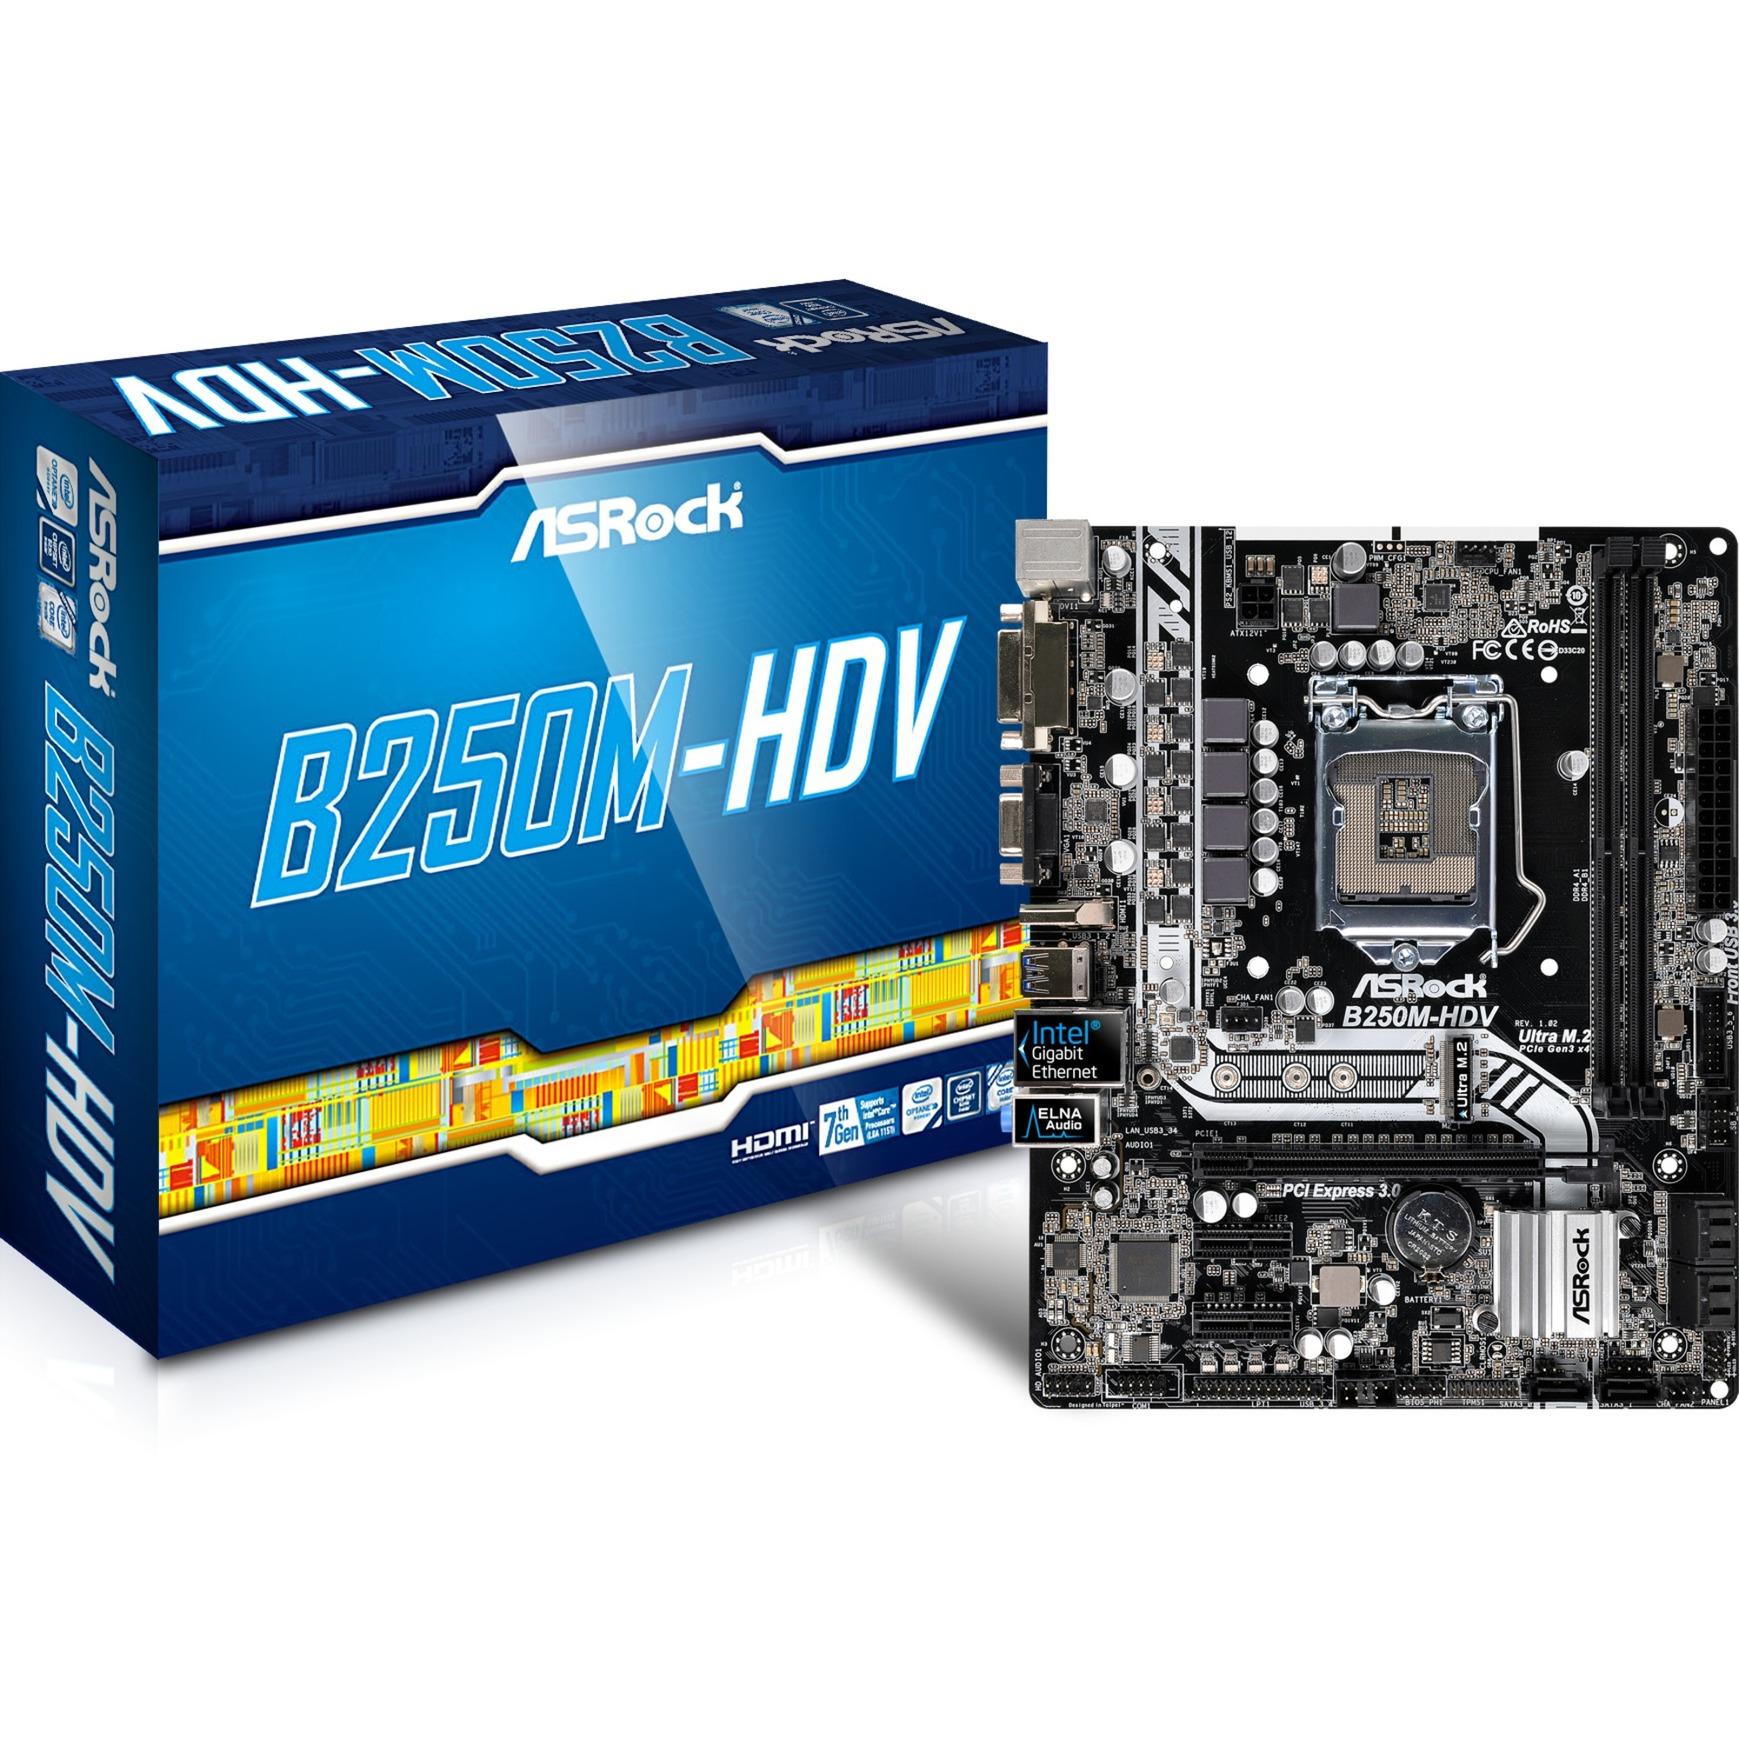 B250M-HDV Intel B250 LGA 1151 (Zócalo H4) Micro ATX, Placa base